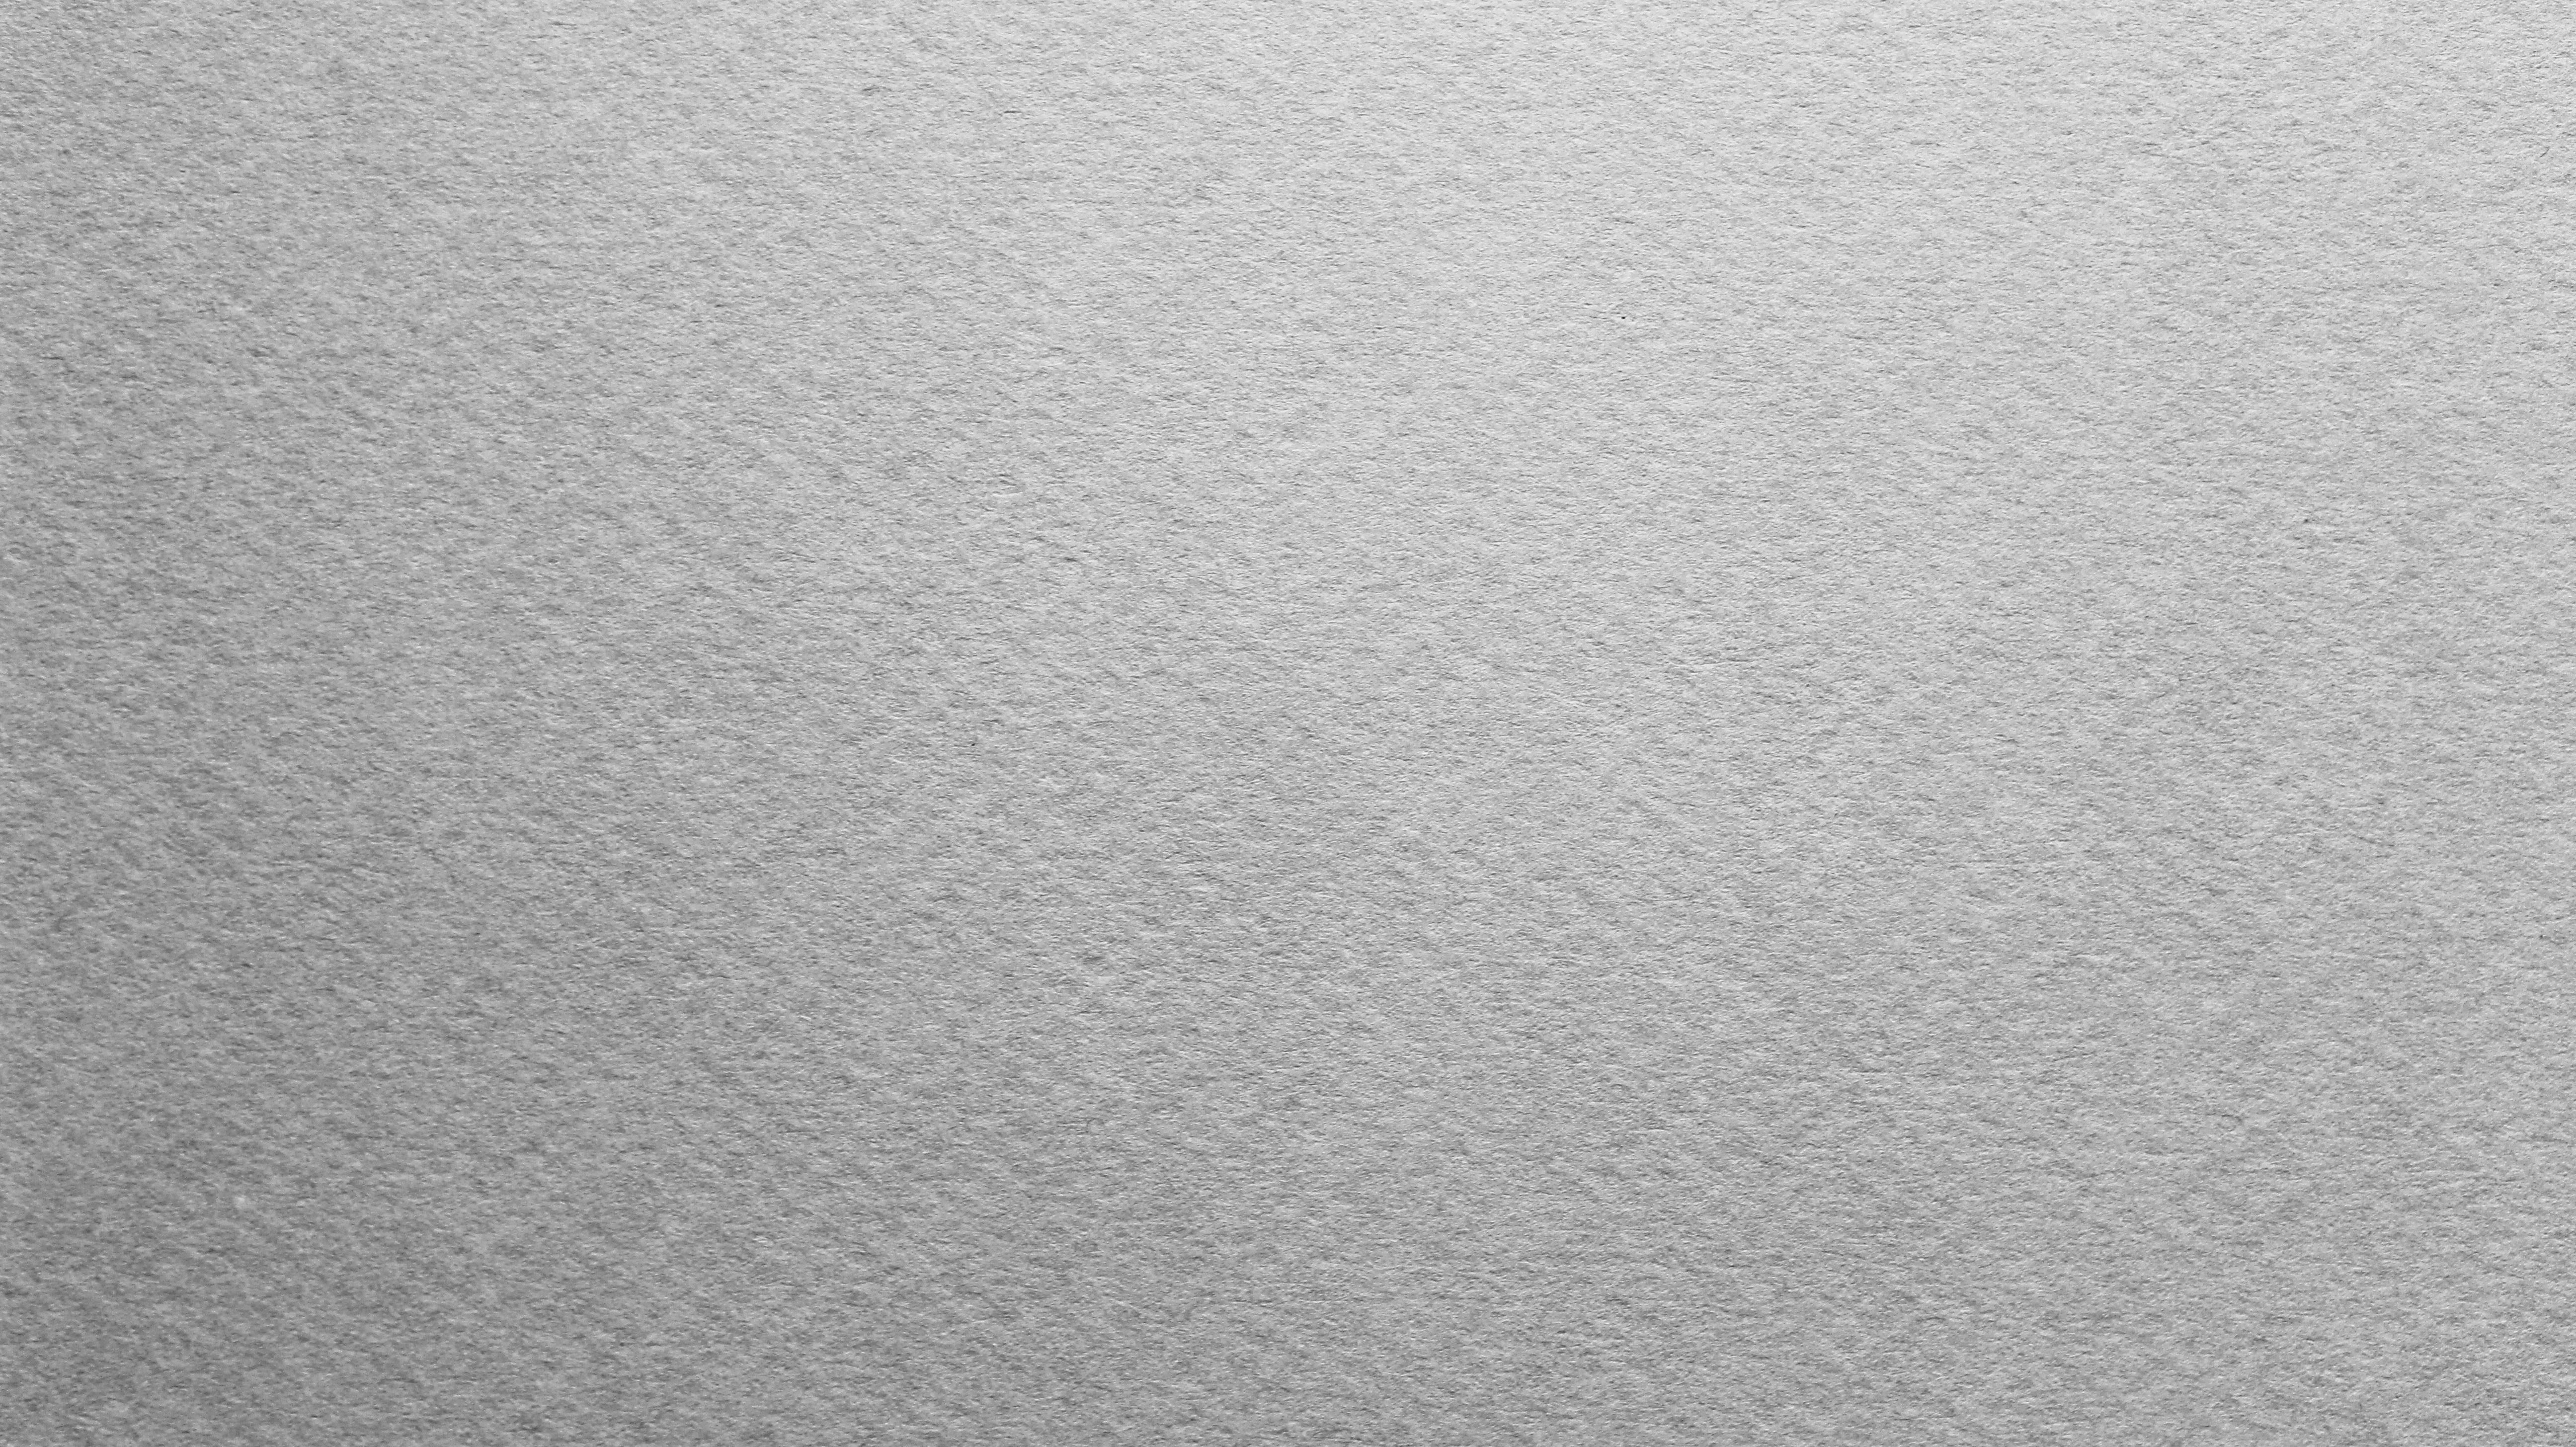 Grey Textured Paper Free Image